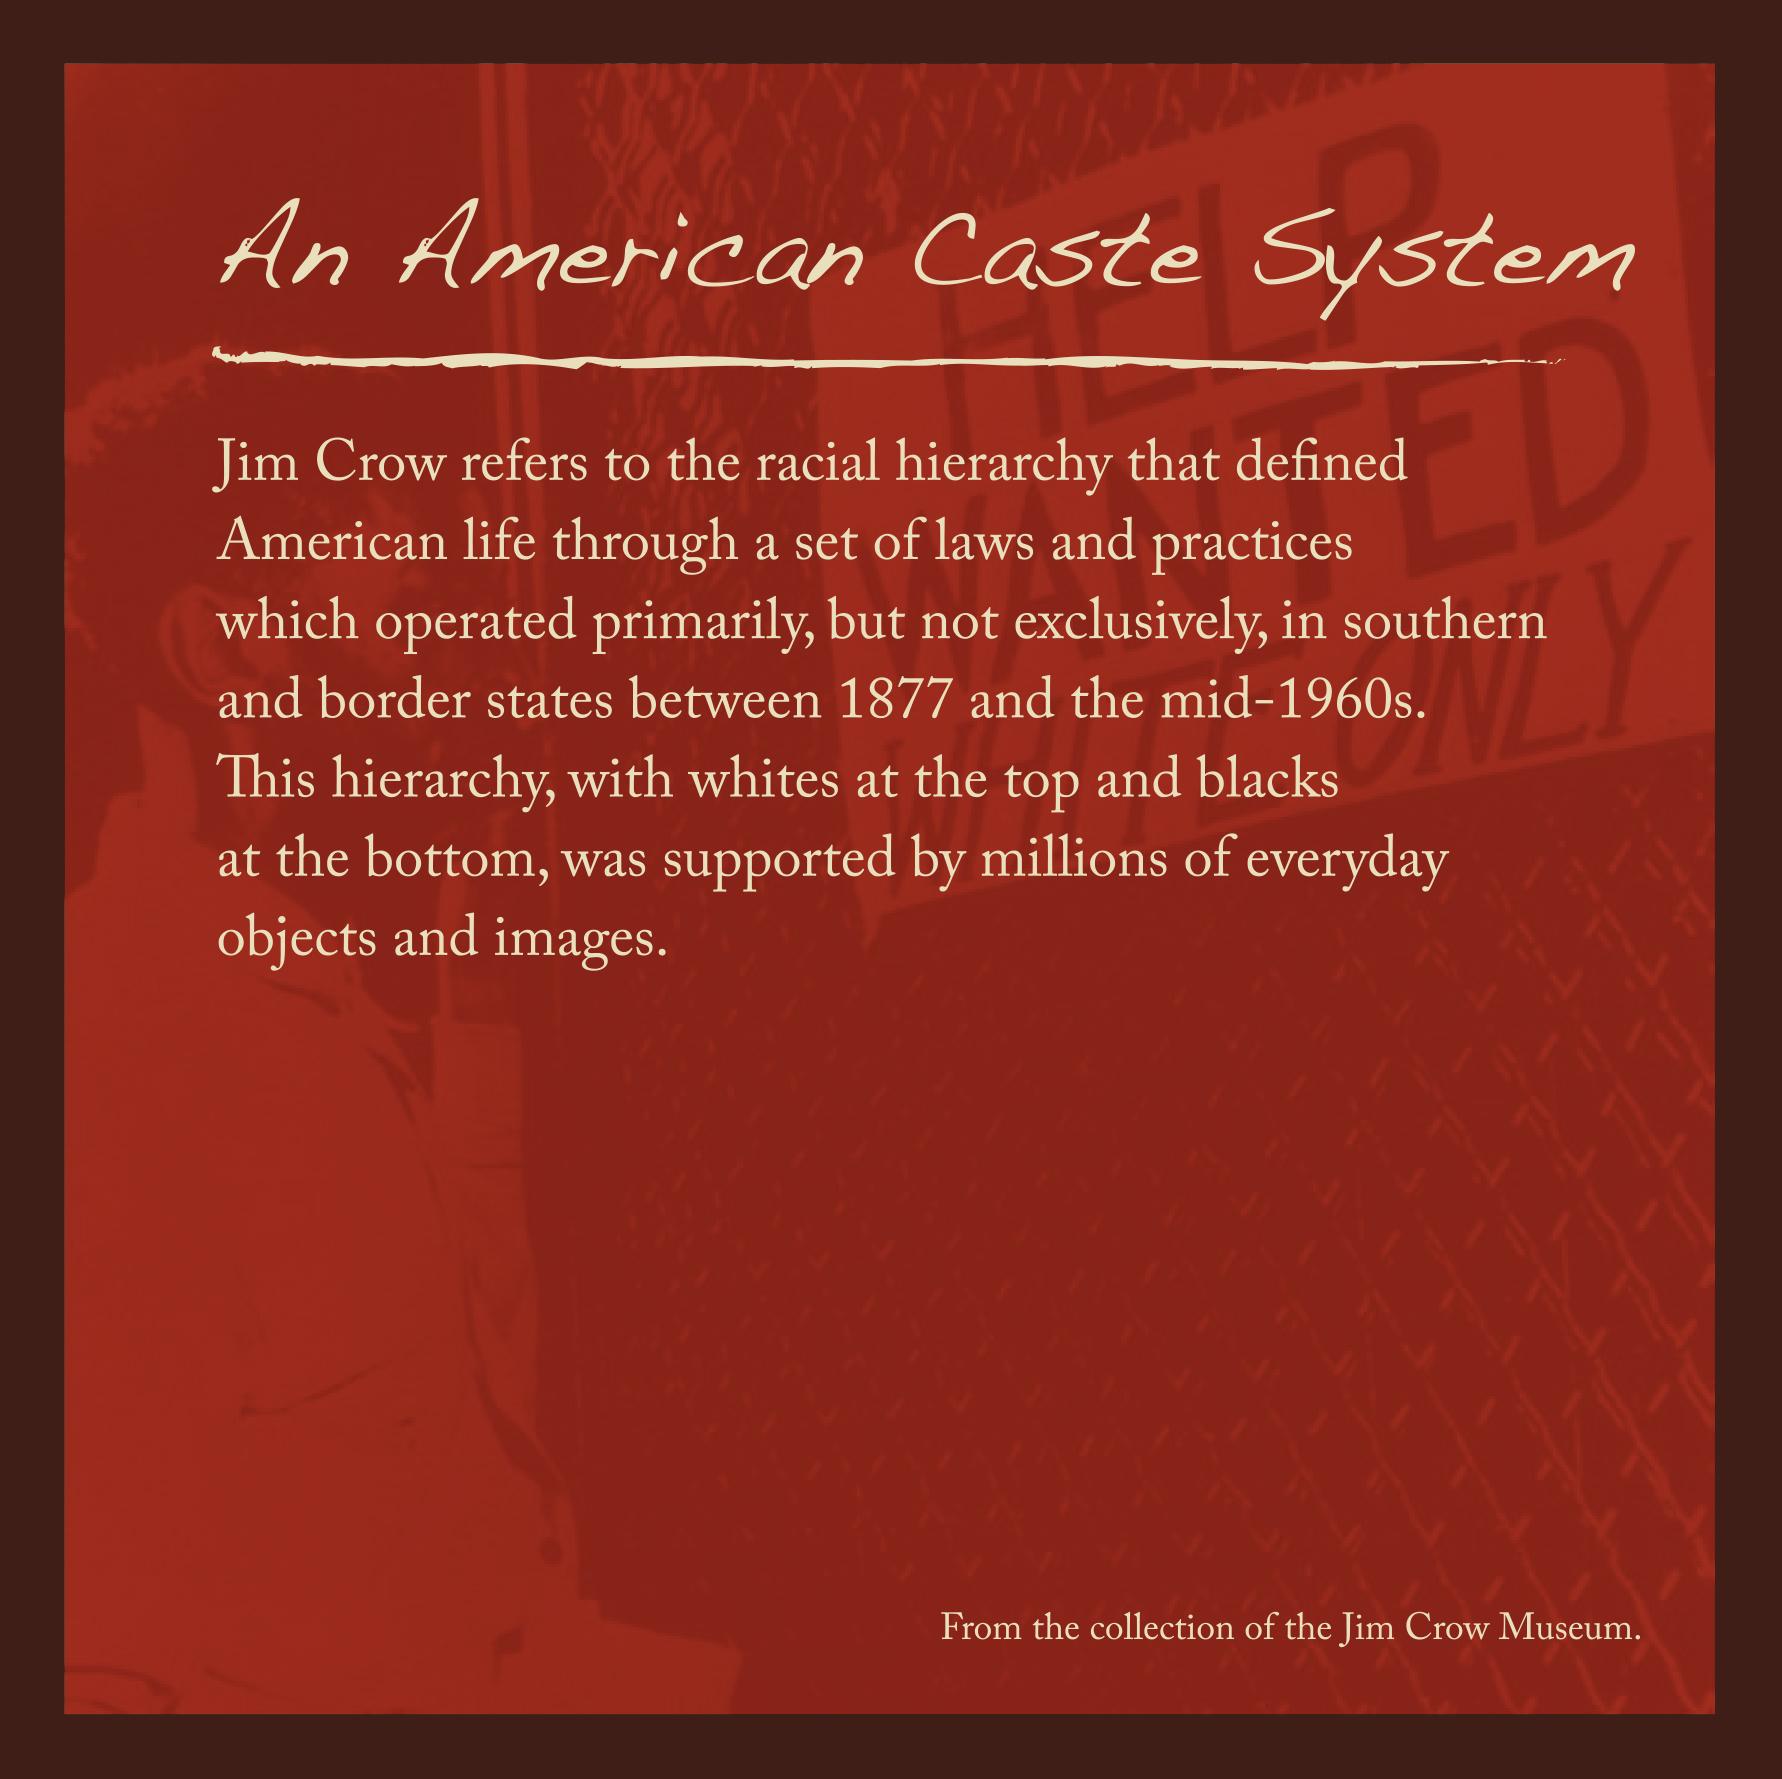 An American Caste System.jpg